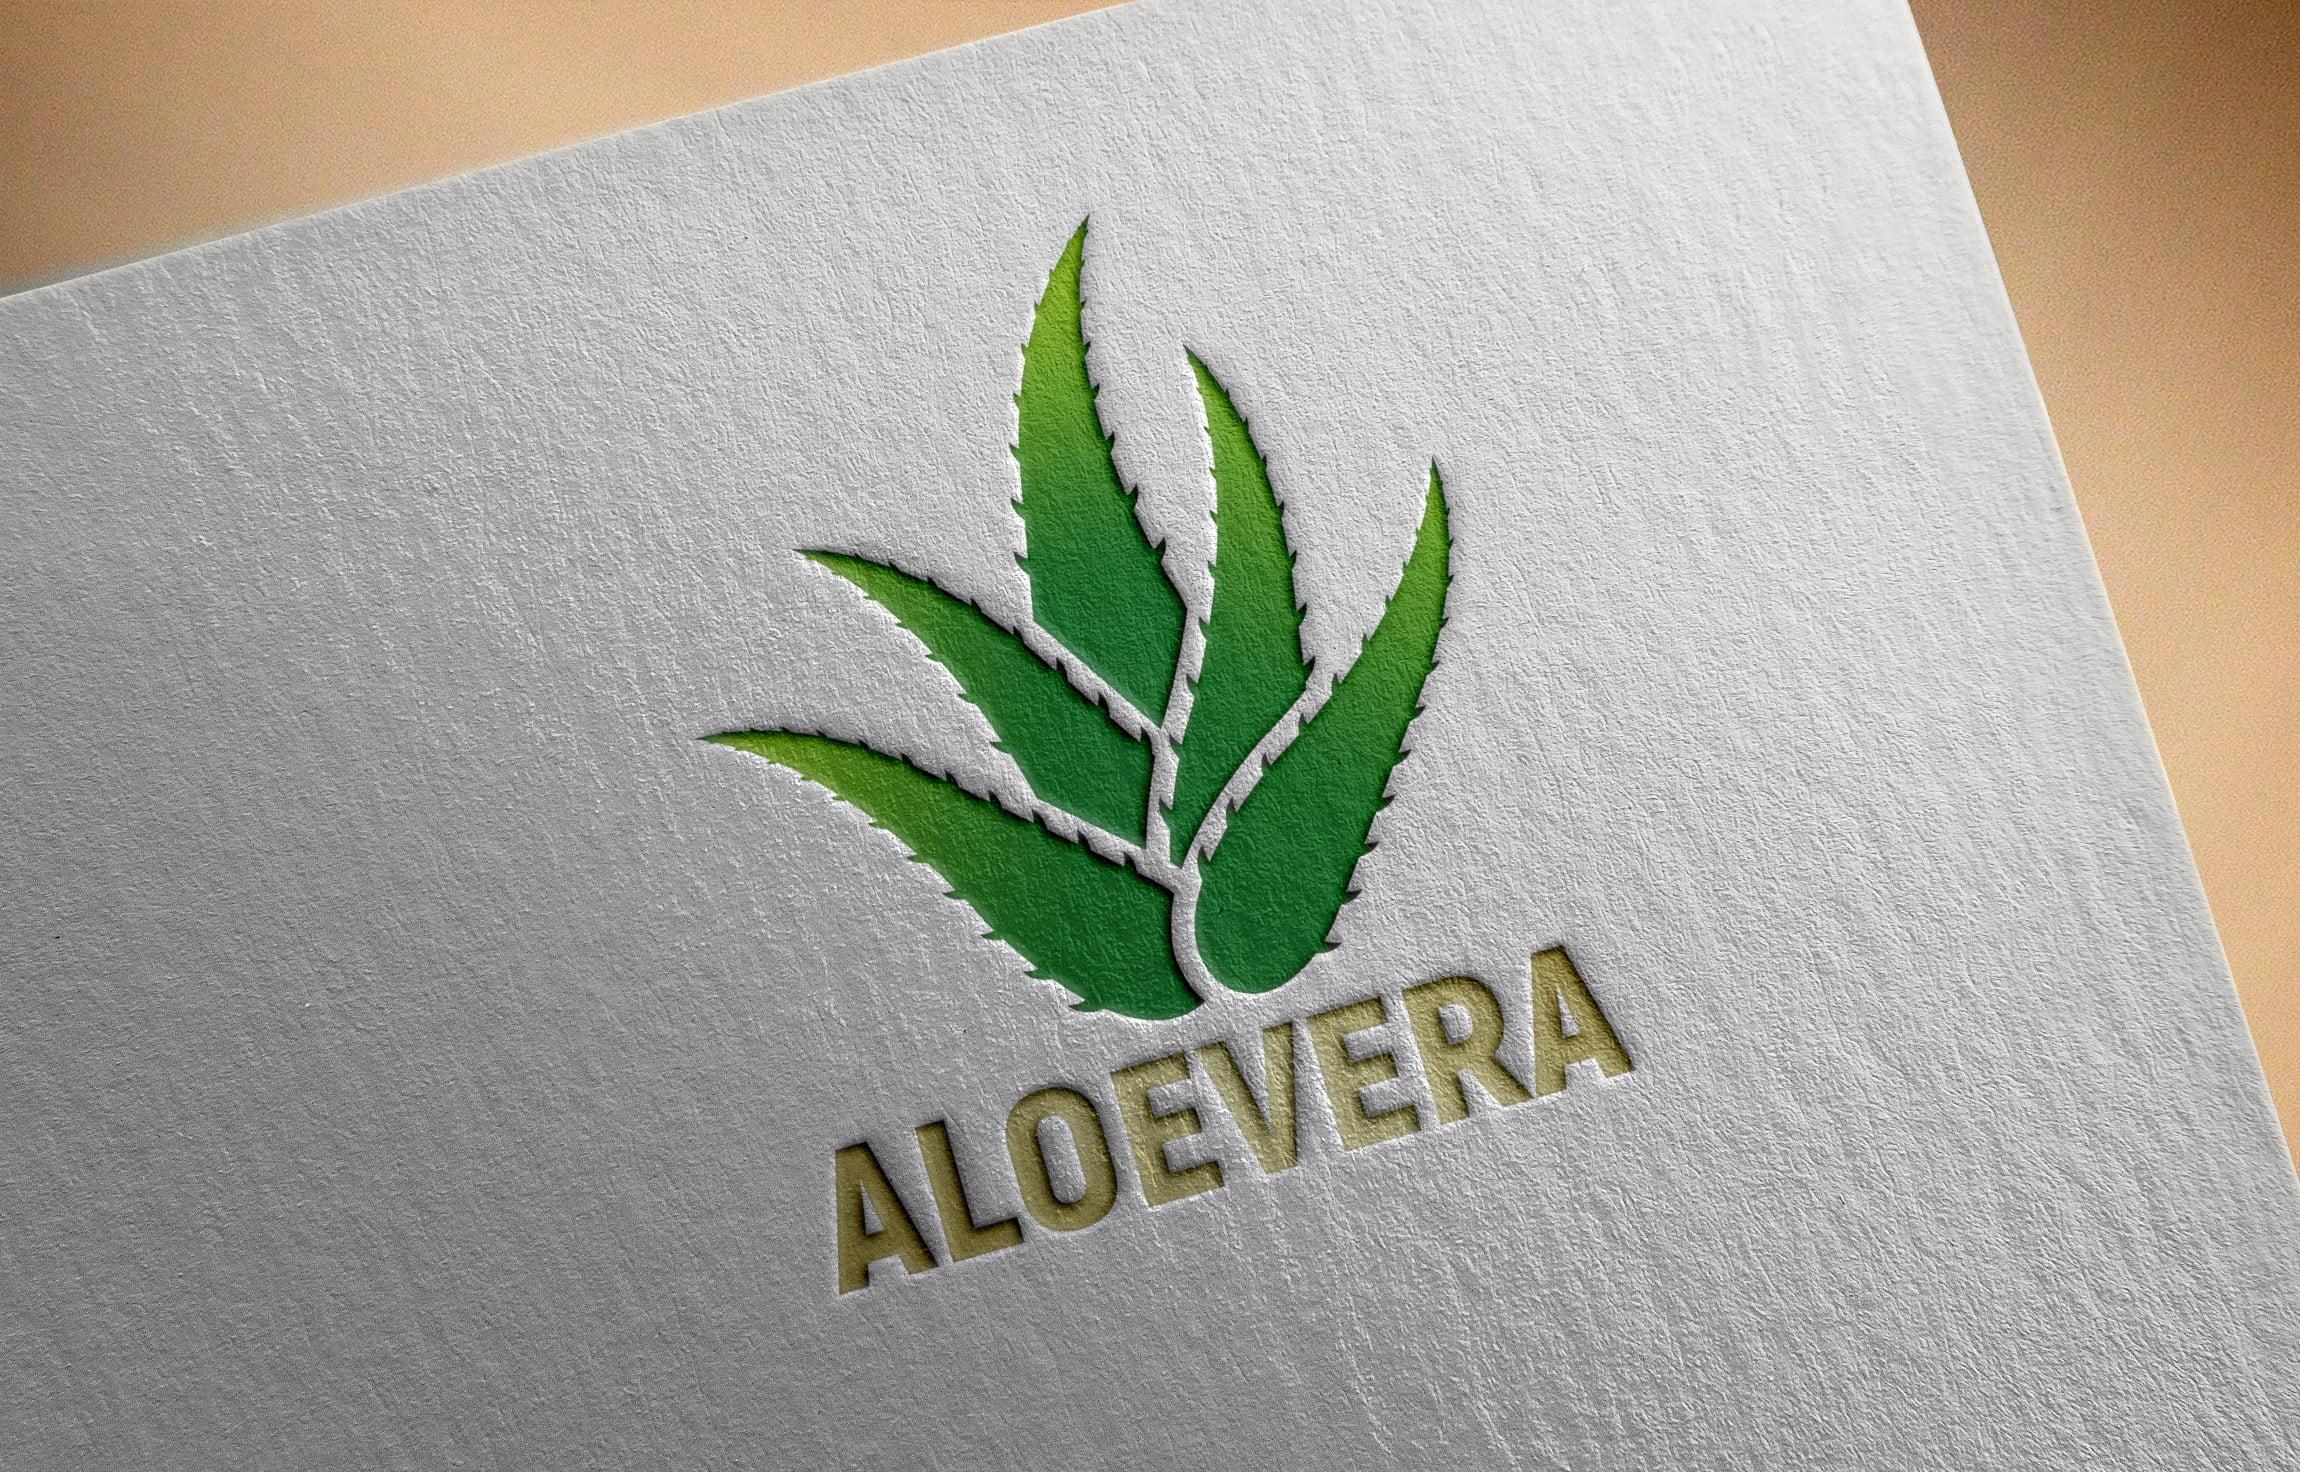 Aloevera-Logo-Design-Free-PSD-Download